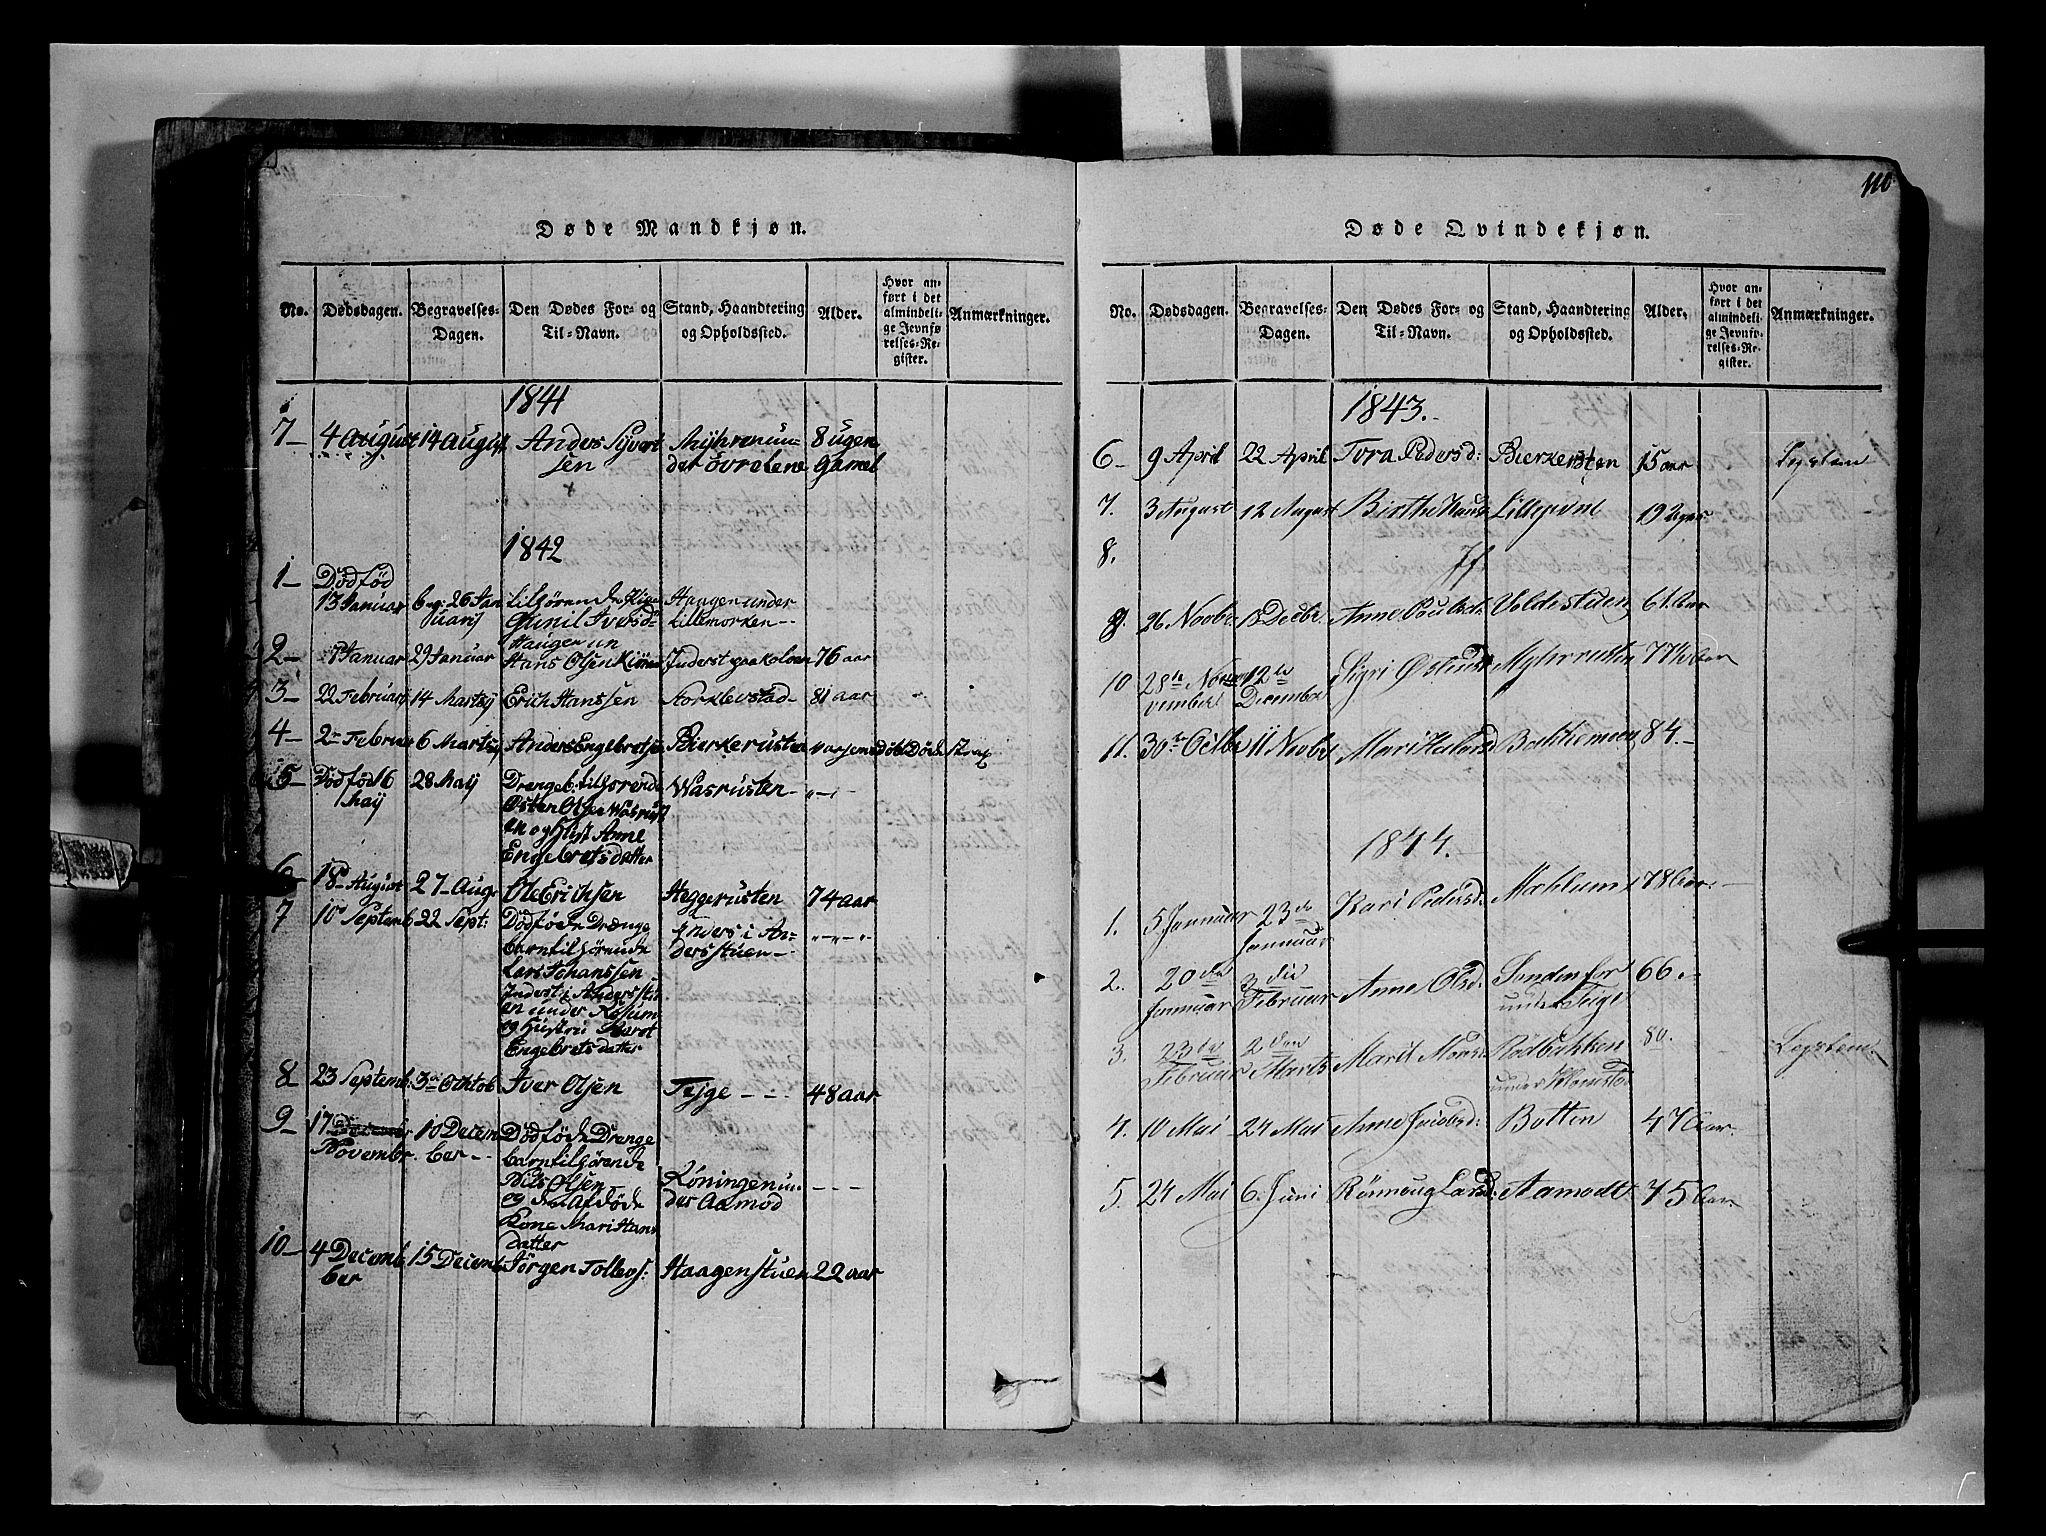 SAH, Fron prestekontor, H/Ha/Hab/L0002: Klokkerbok nr. 2, 1816-1850, s. 110